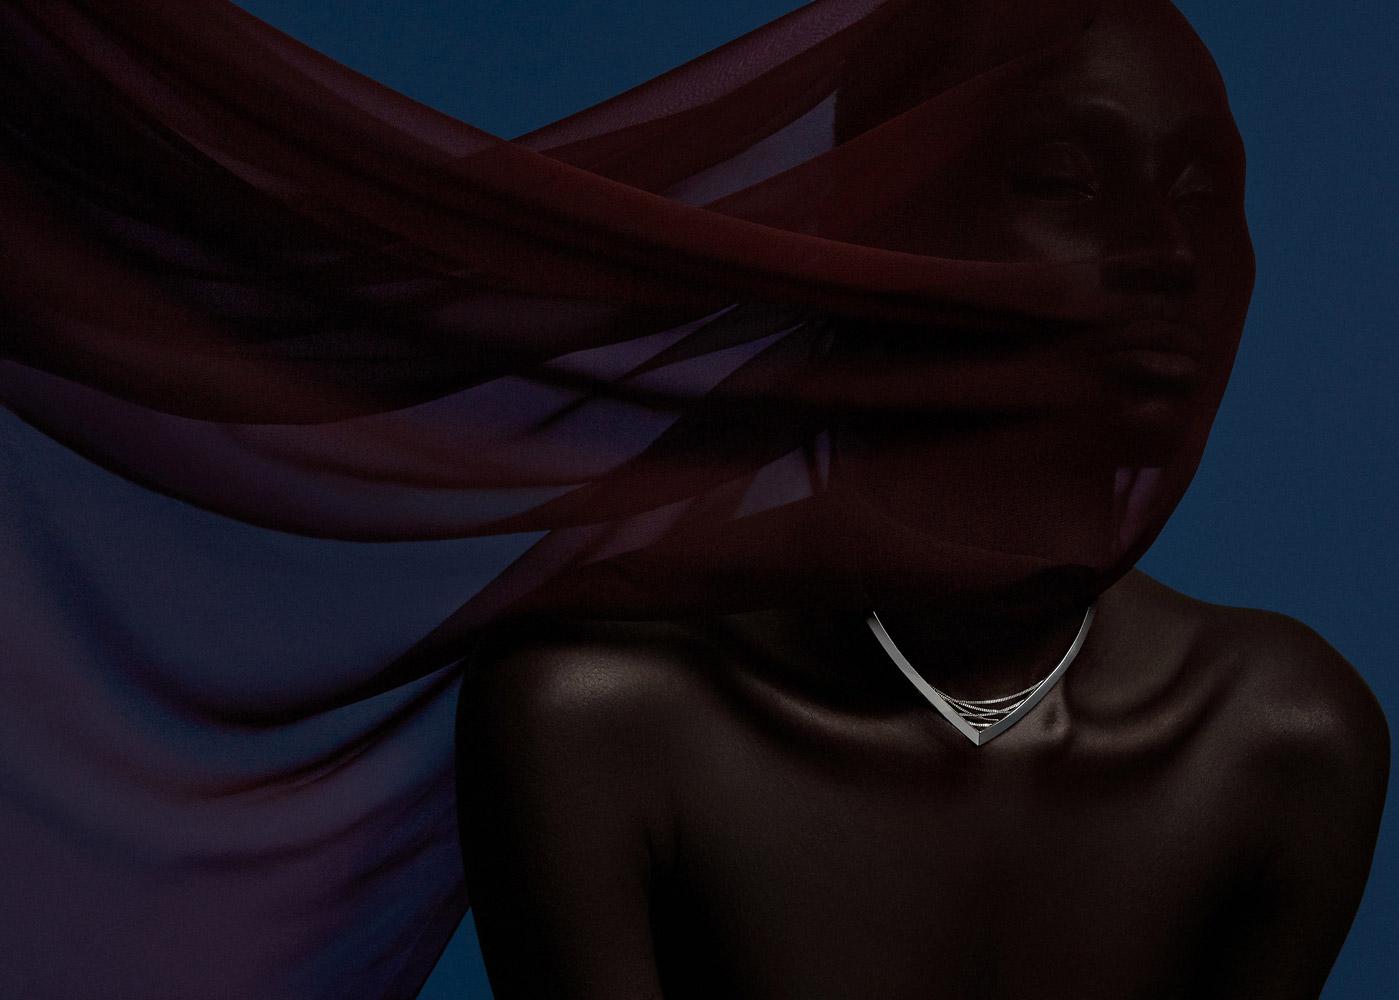 «Без названия», © Рикардо Ривера / Ricardo Rivera, Бруклин, США, Первое место в категории «Реклама», Гран-при конкурса, «Взгляд» — фотоконкурс на тему «Мода» | PDN The Look